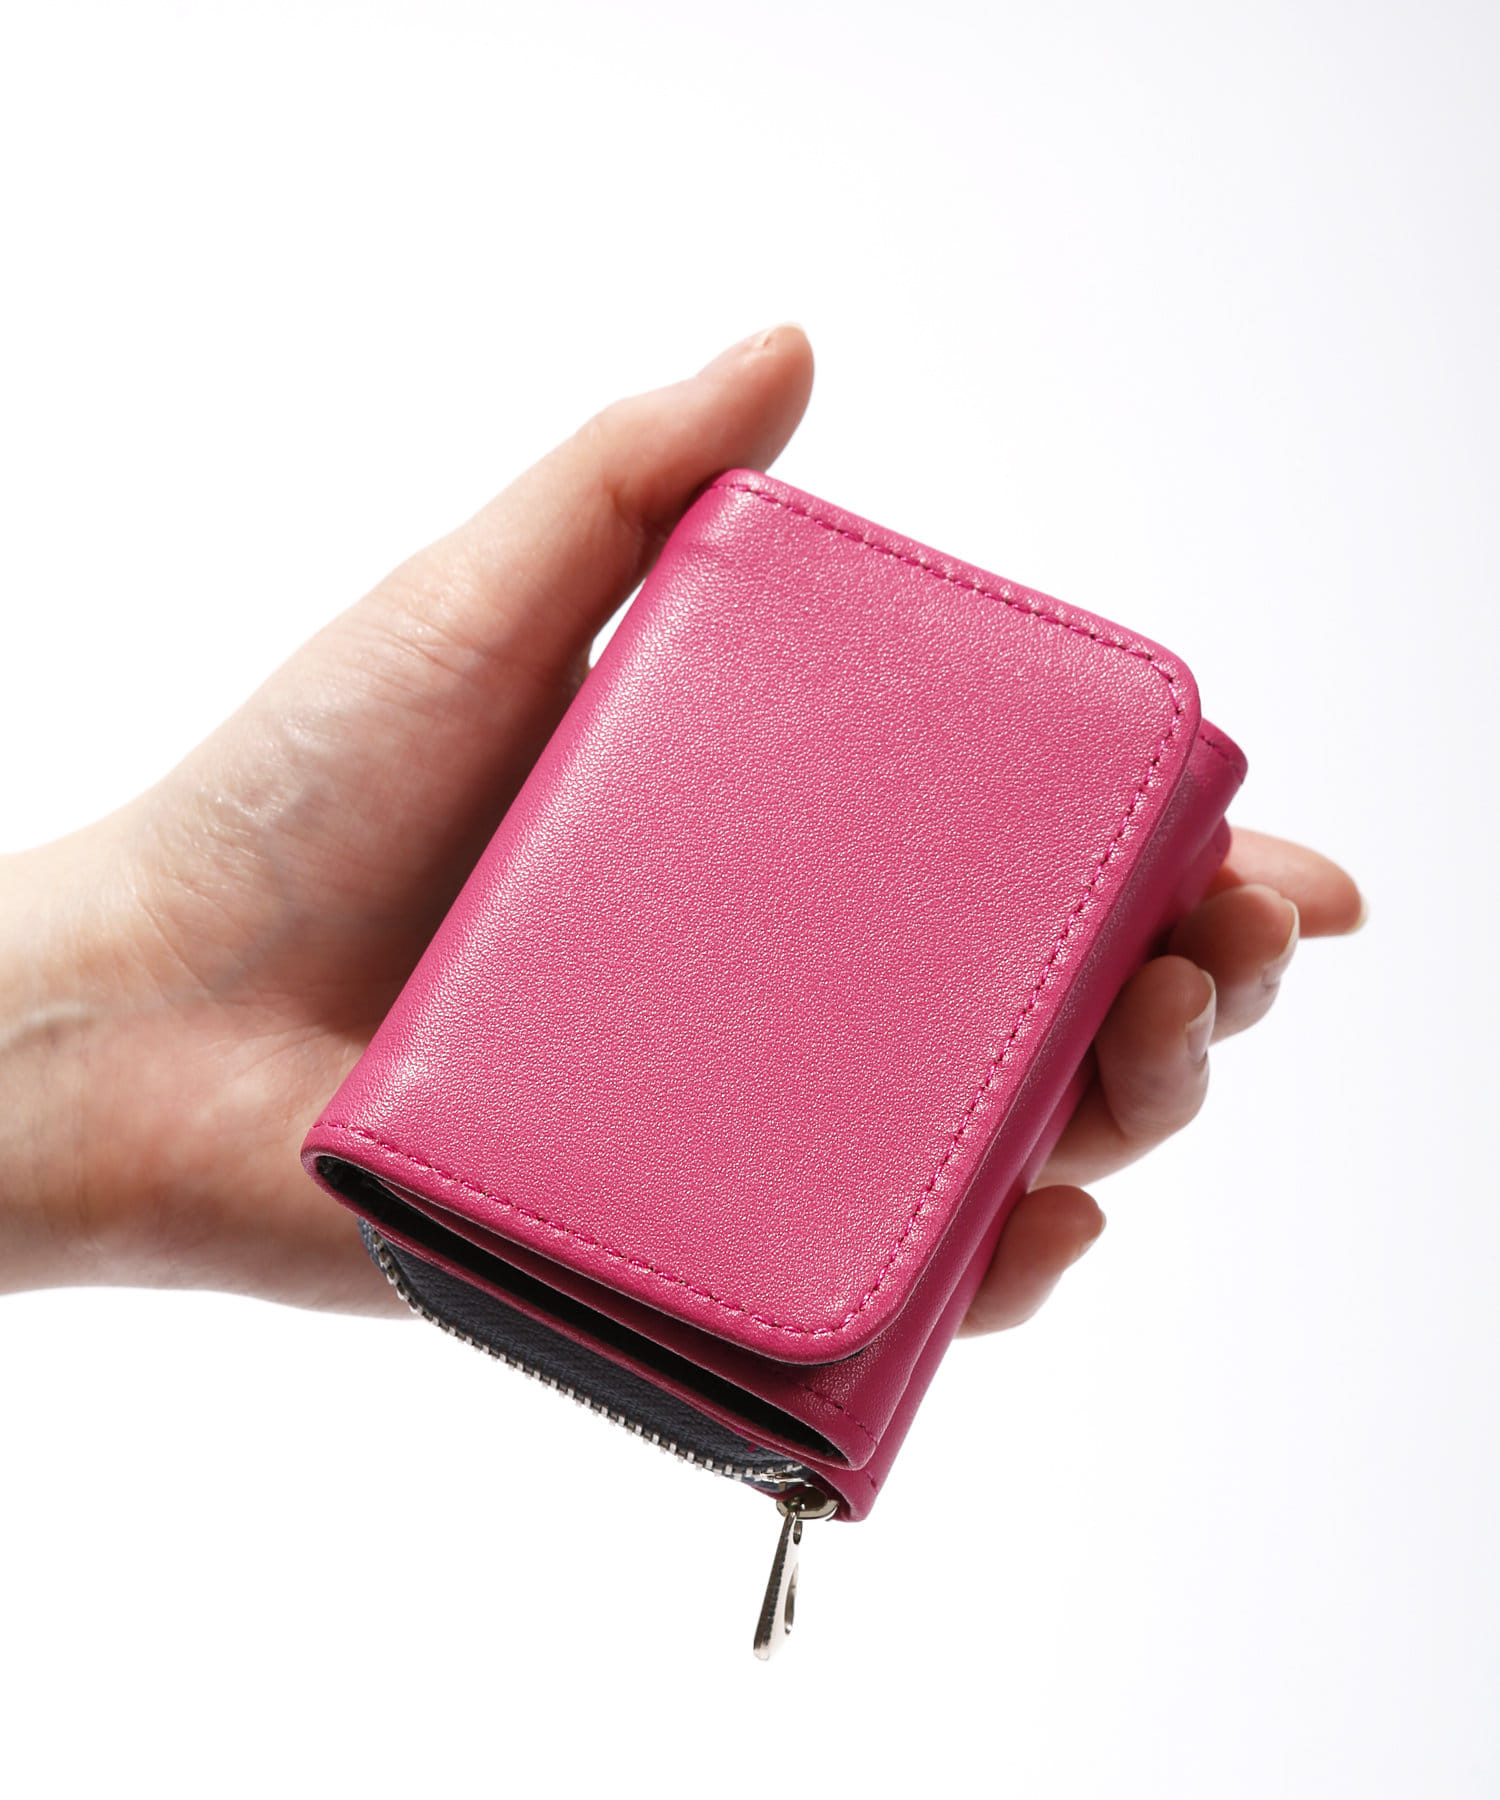 3COINS(スリーコインズ) 【ASOKO】めっちゃ小さいお財布